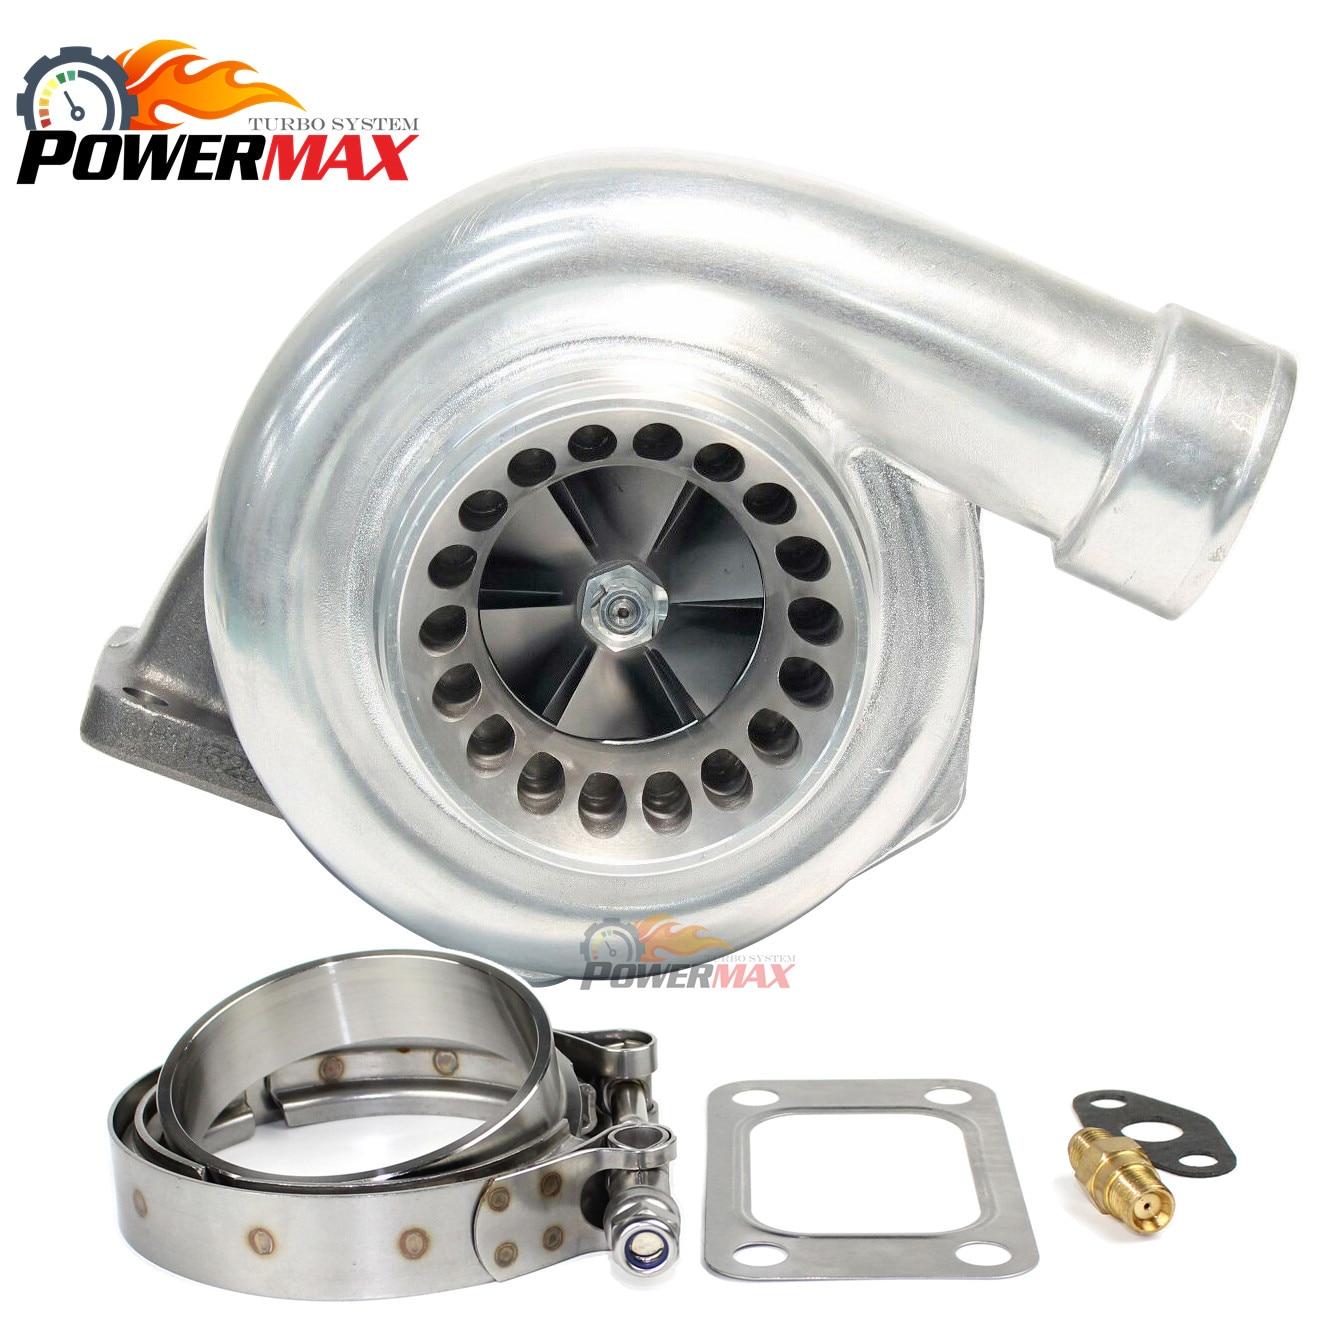 Universal rendimiento GT35 GT3582 turbocompresor T3 63 Vband carcasa de turbina